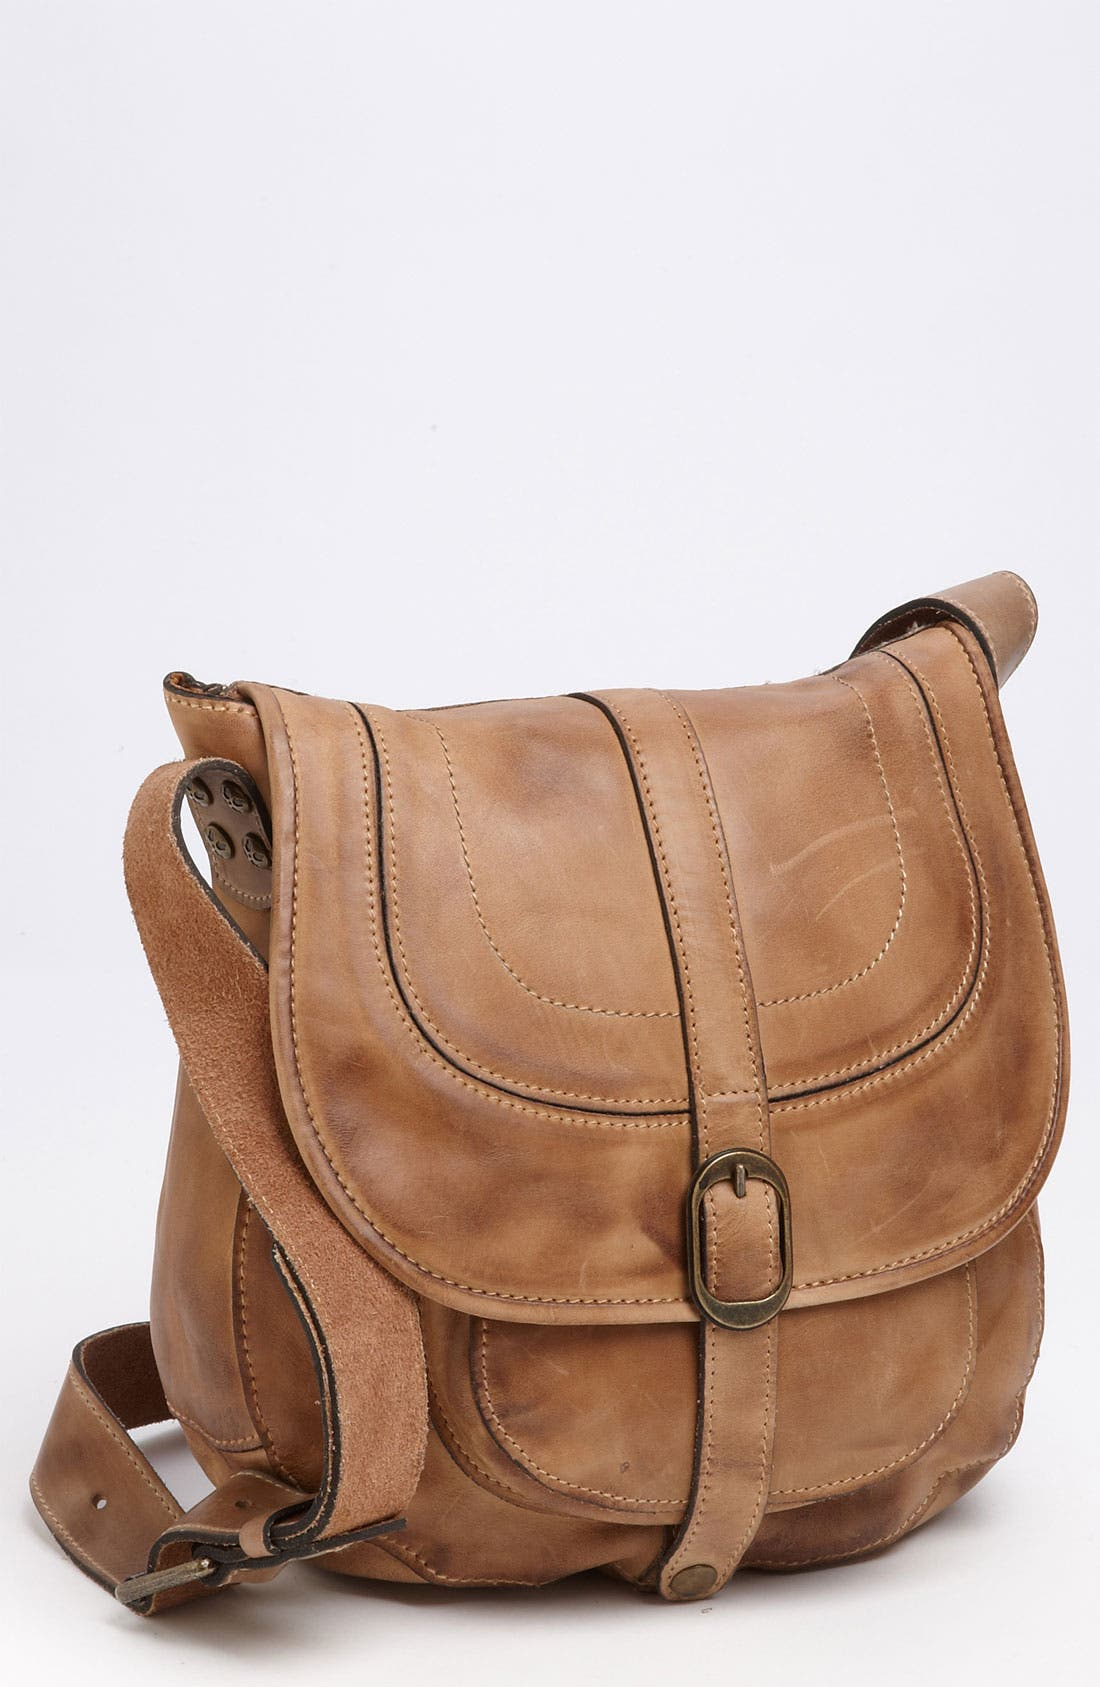 Alternate Image 1 Selected - Patricia Nash 'Barcelona' Saddle Bag